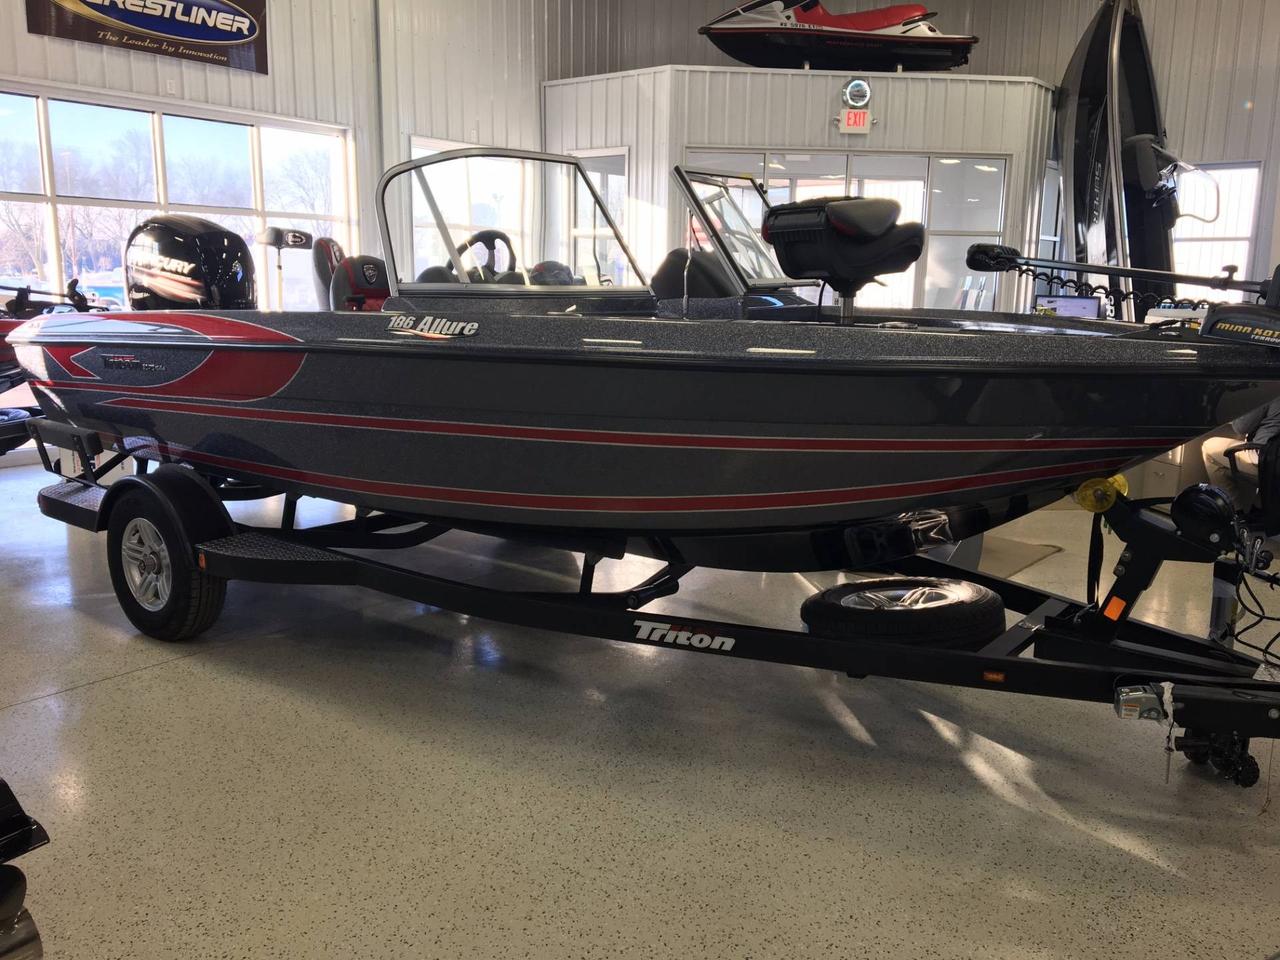 2017 new triton 186 allure ski and fish boat for sale for Fish and ski boats for sale